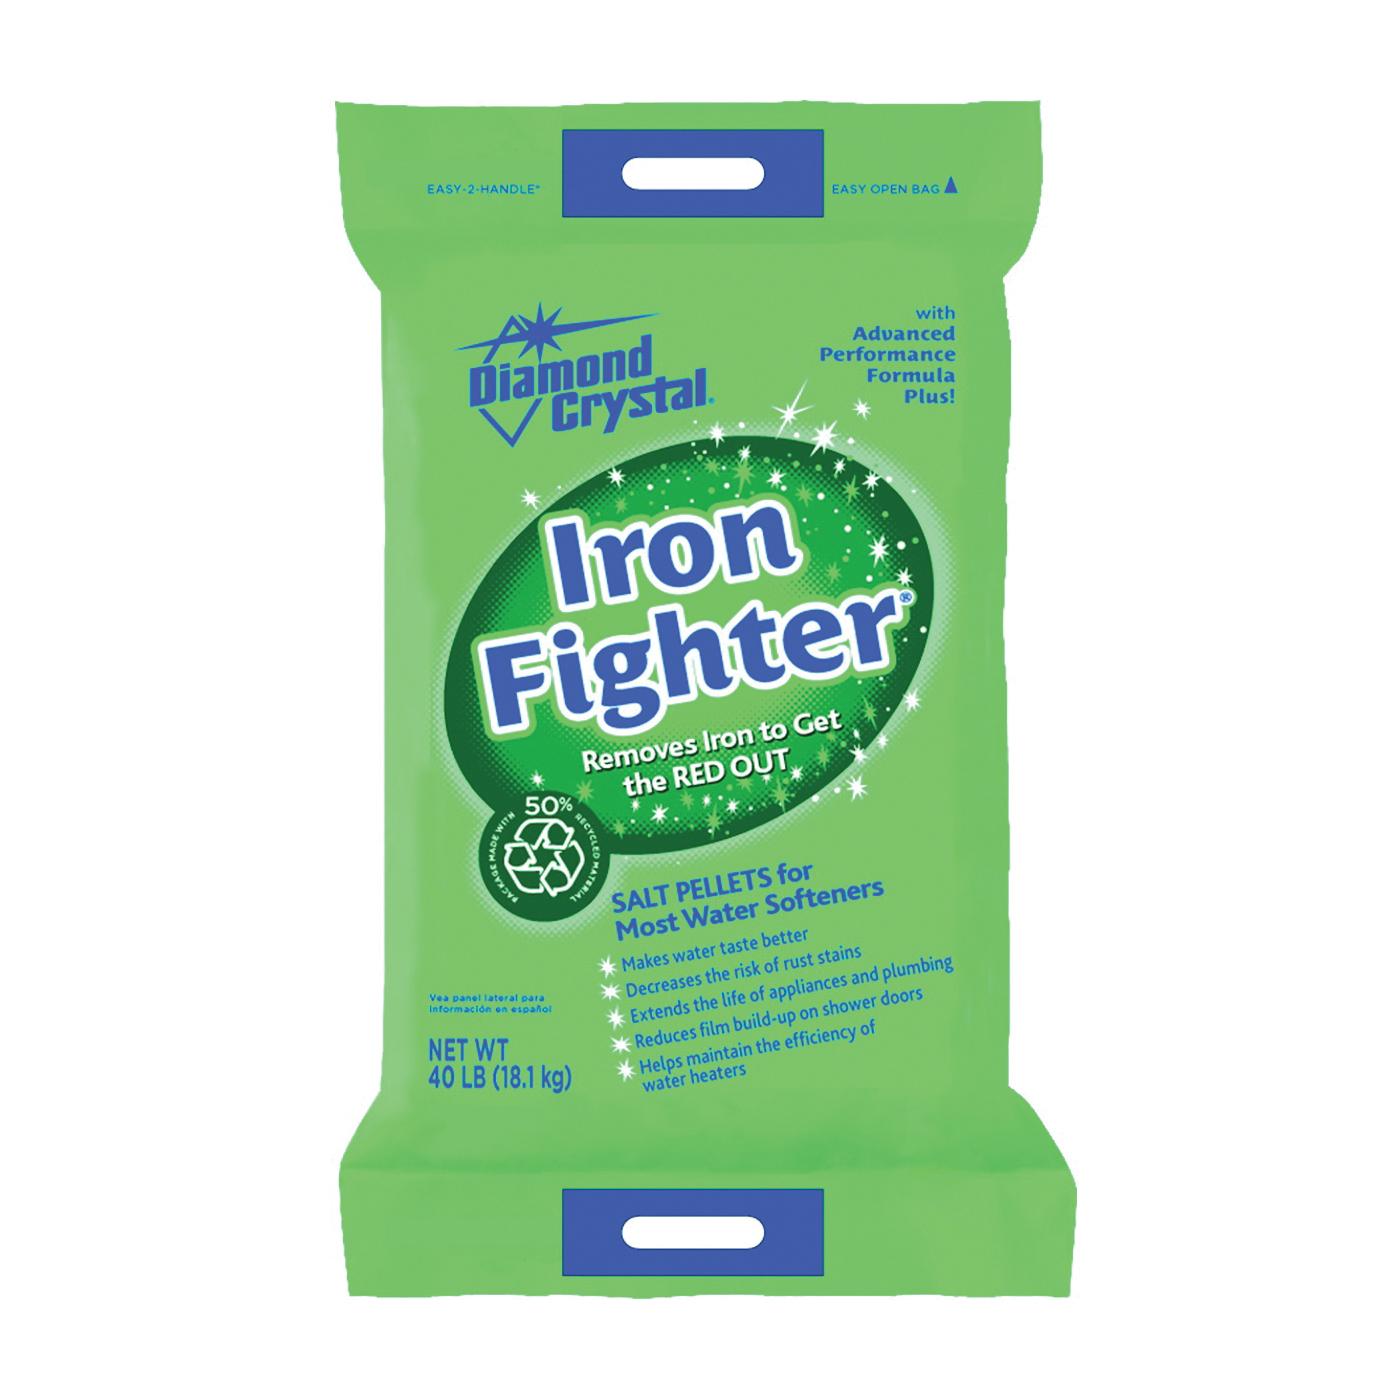 Picture of Cargill Diamond Crystal Iron Fighter 100012408 Salt Pellets, 40 lb Package, Bag, Crystalline Solid, Halogen